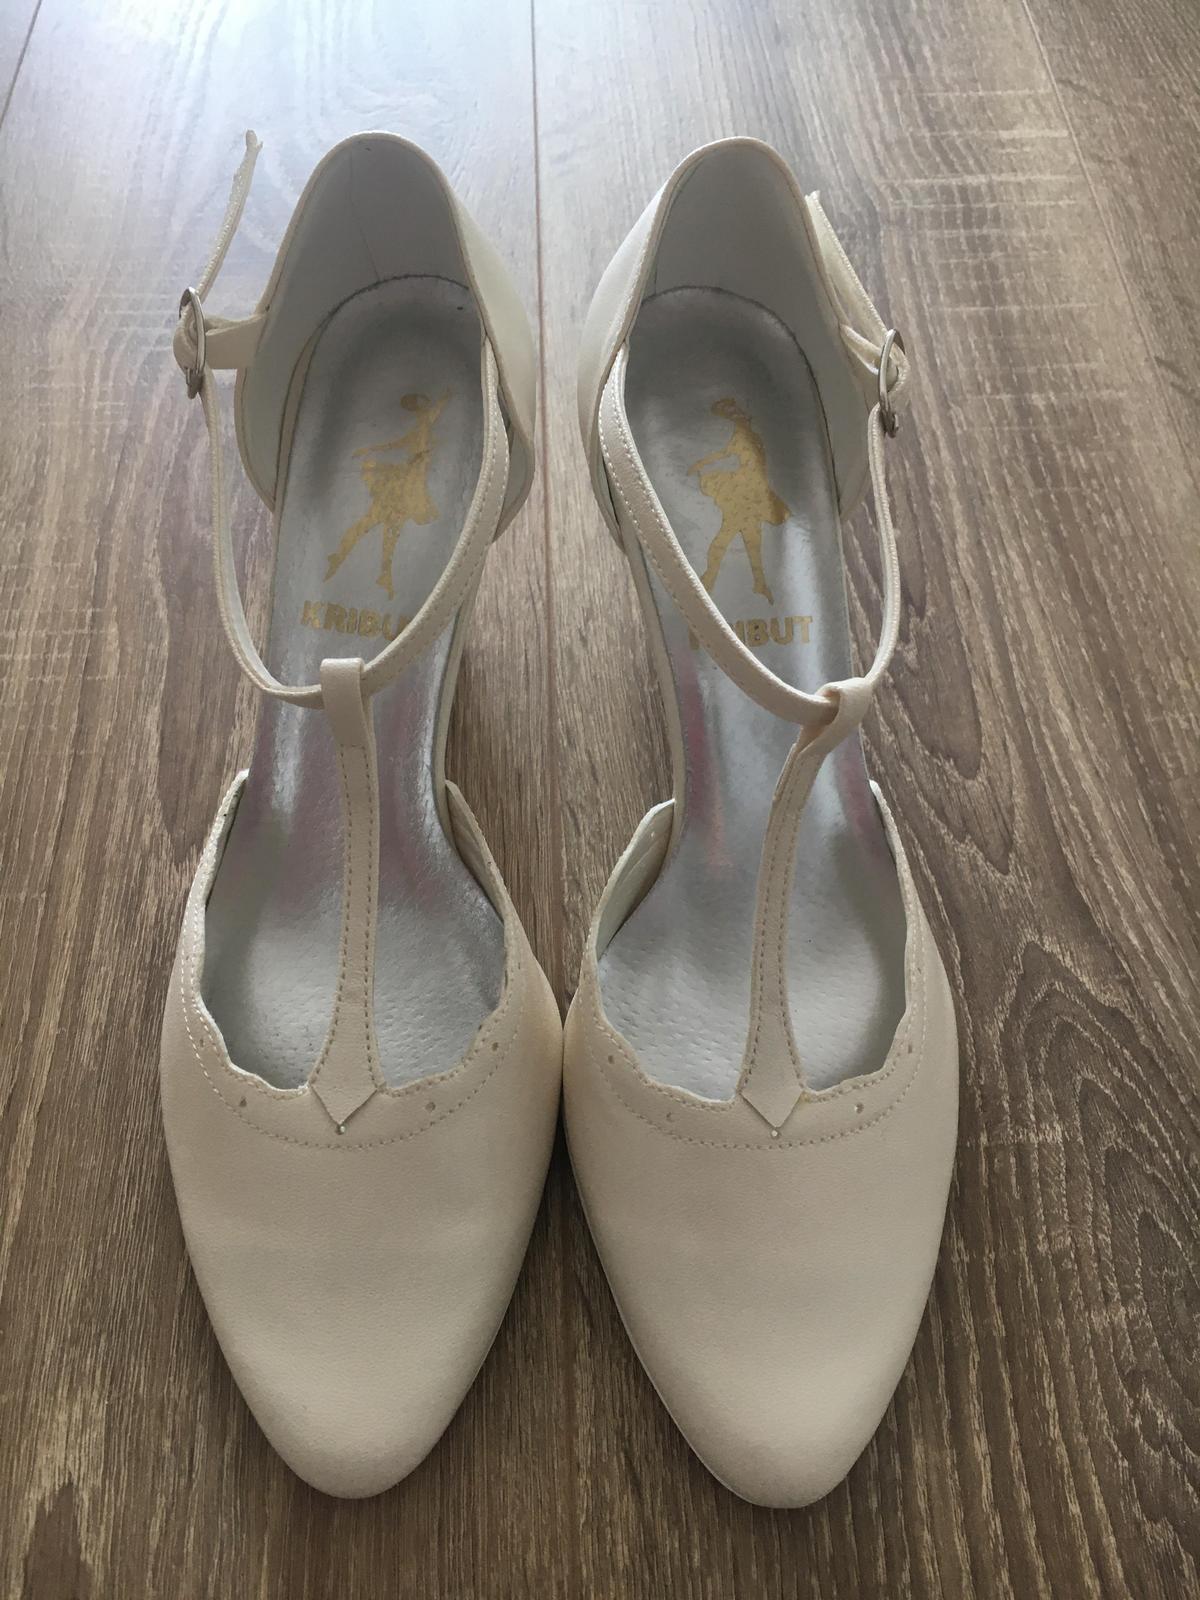 Svadobné topánky - nepoužívané - Obrázok č. 1